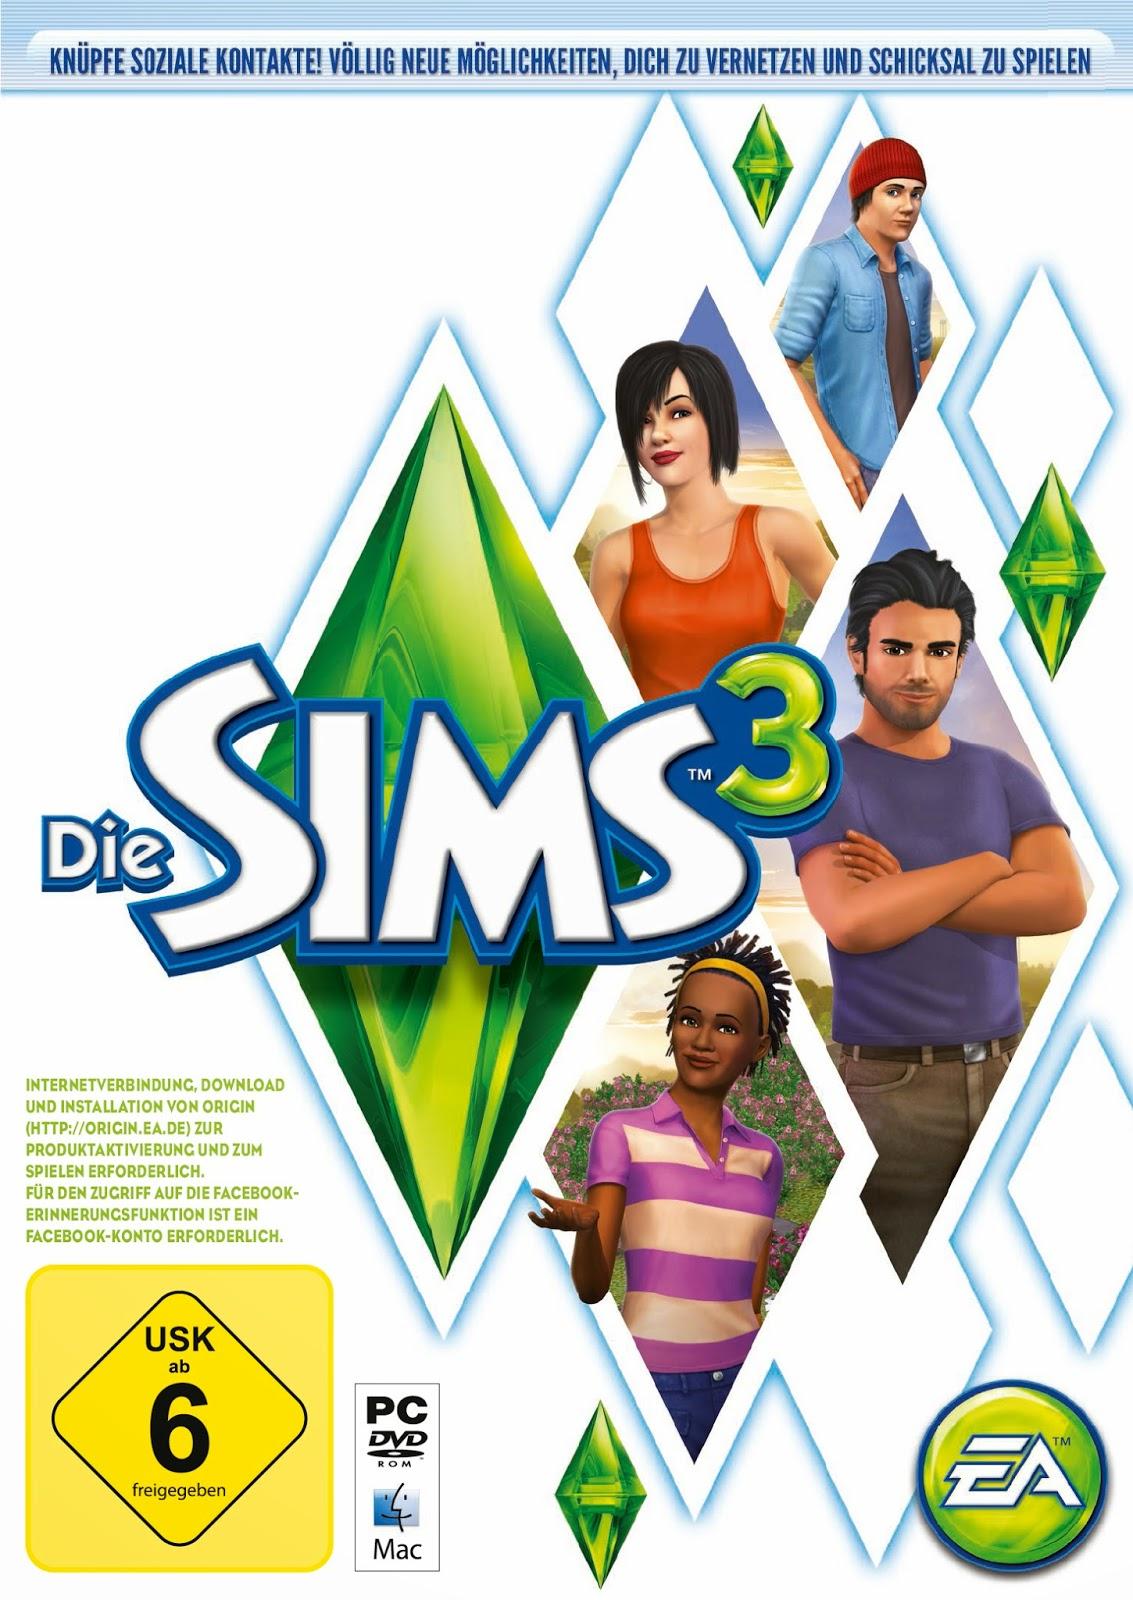 http://www.amazon.de/Die-Sims-Mac-Origin-Code/dp/B008MAQ6LM/ref=sr_1_2?ie=UTF8&qid=1405939101&sr=8-2&keywords=die+sims+3